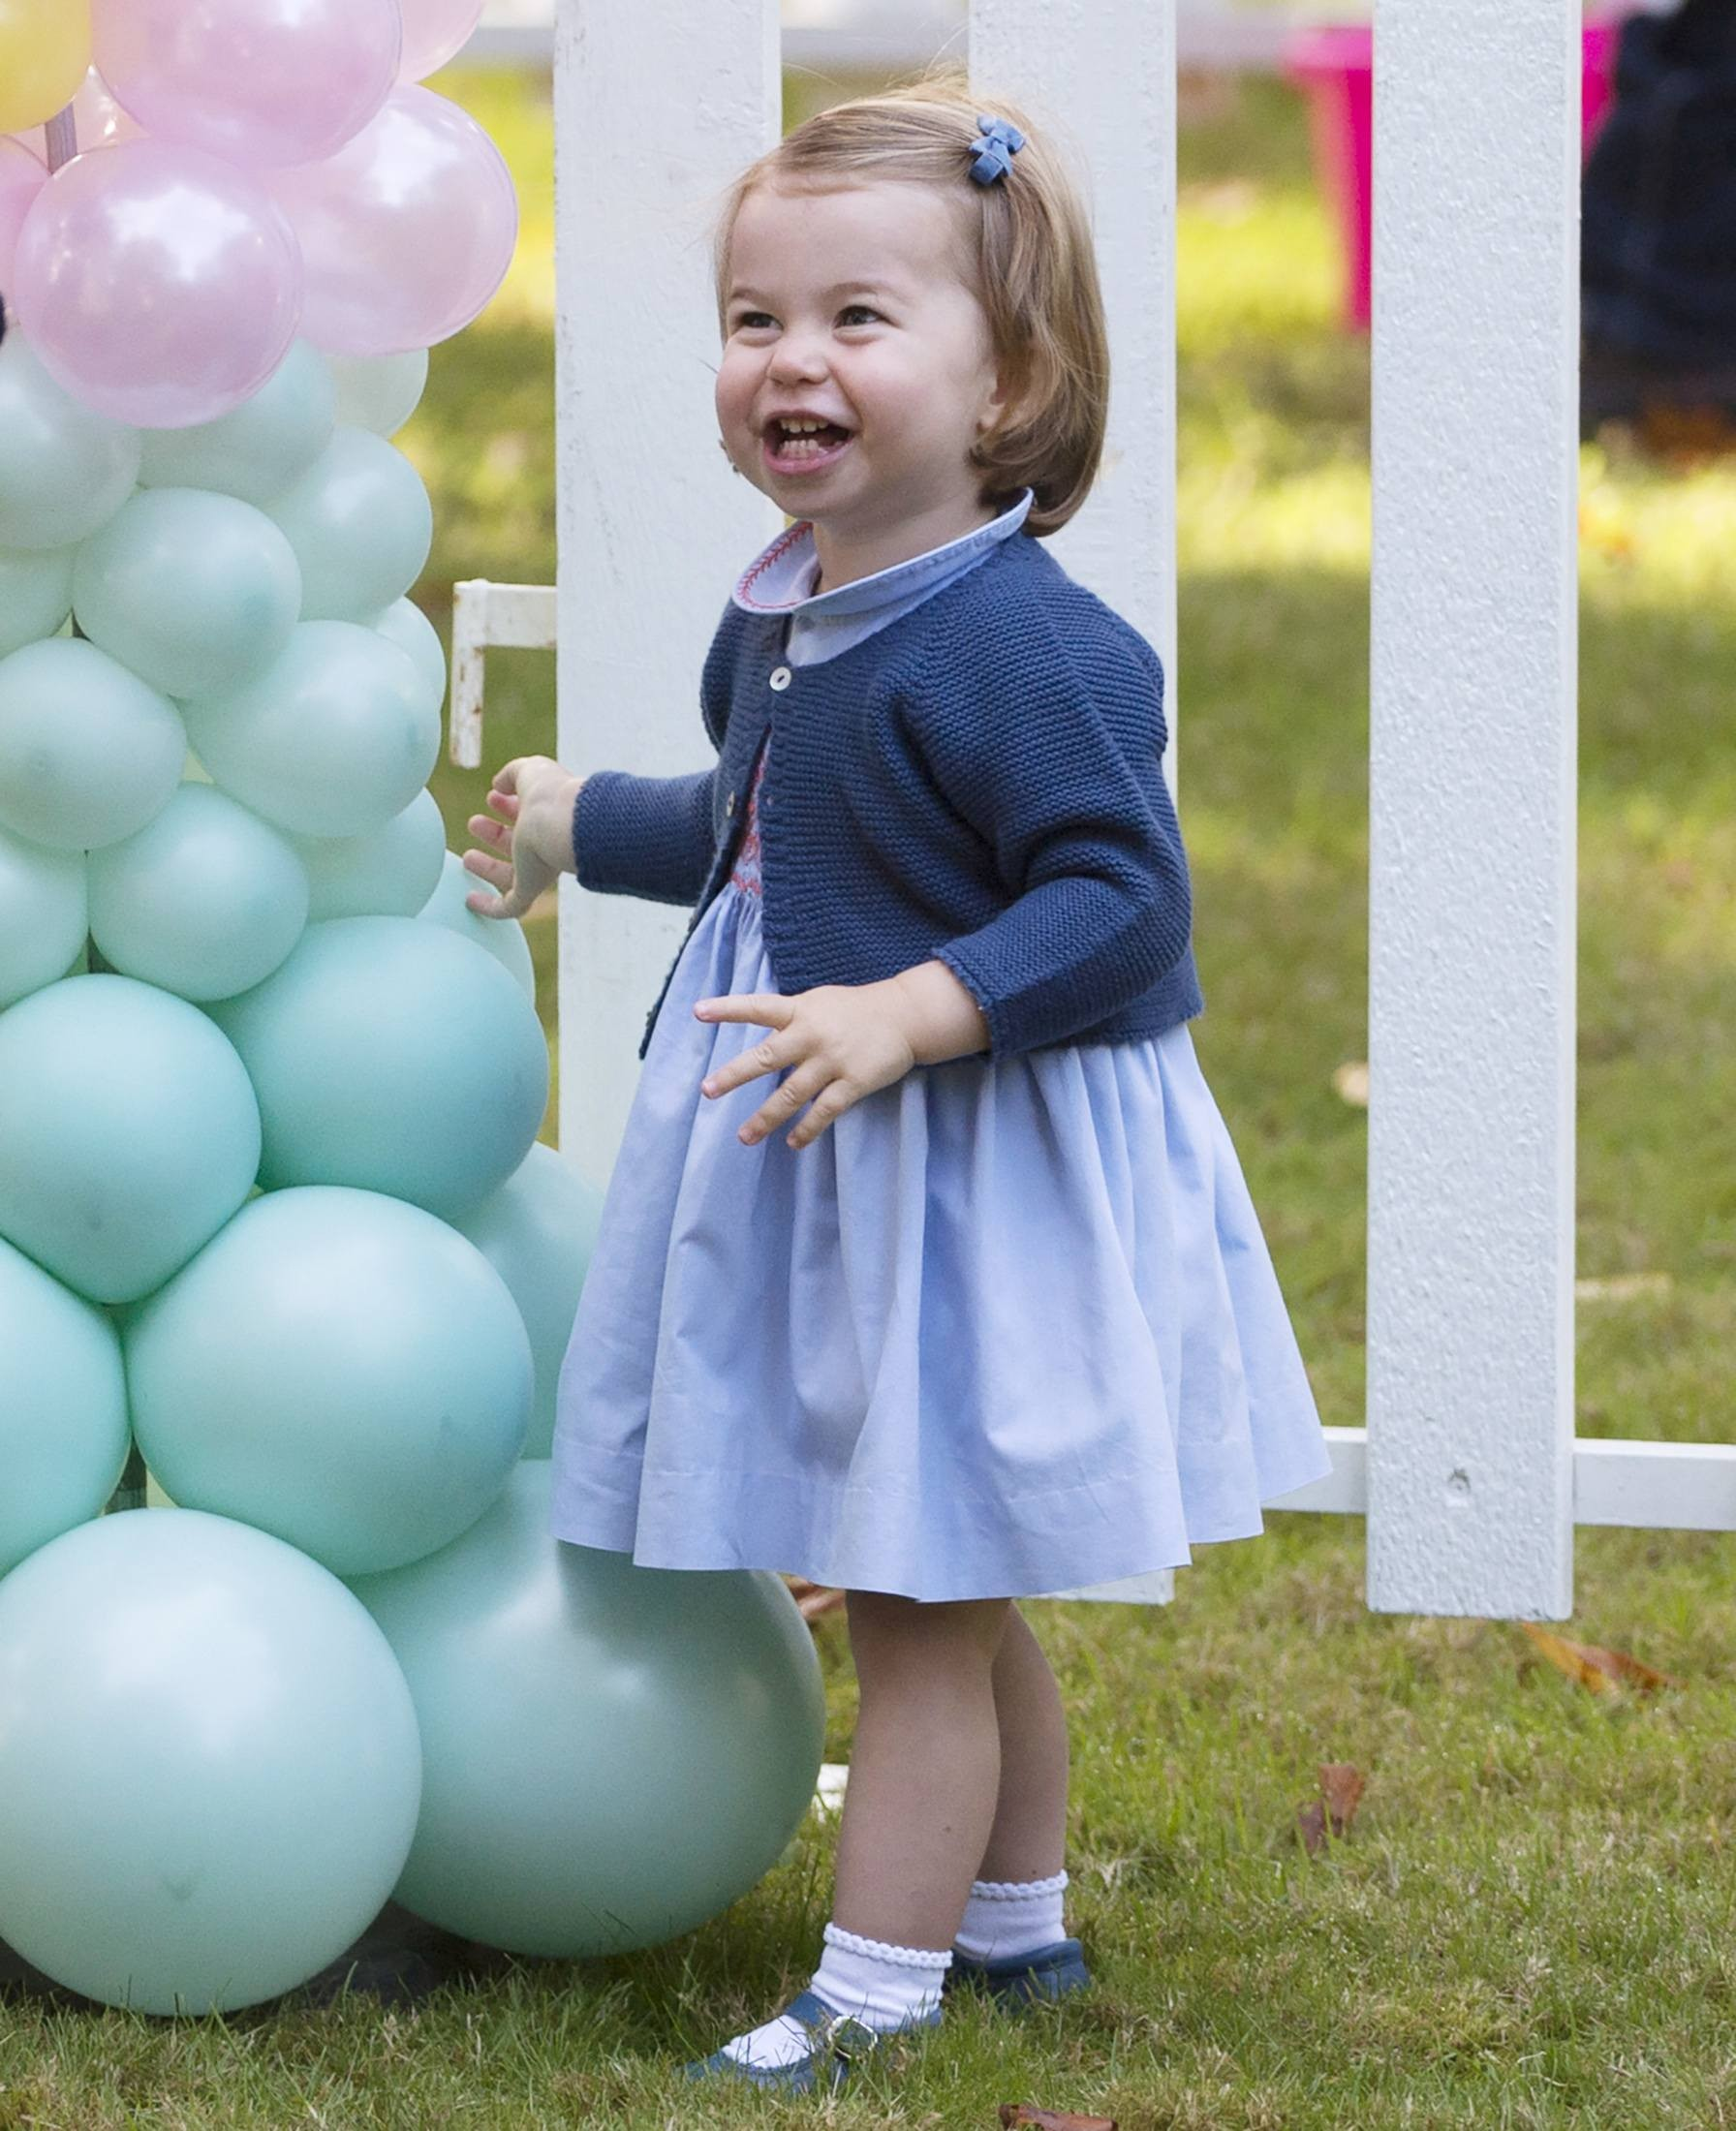 Princesa Charlotte durante festa a familiares de militares nesta quinta-feira (29) no Canadá (Foto: REUTERS/Jonathan Hayward/Pool)